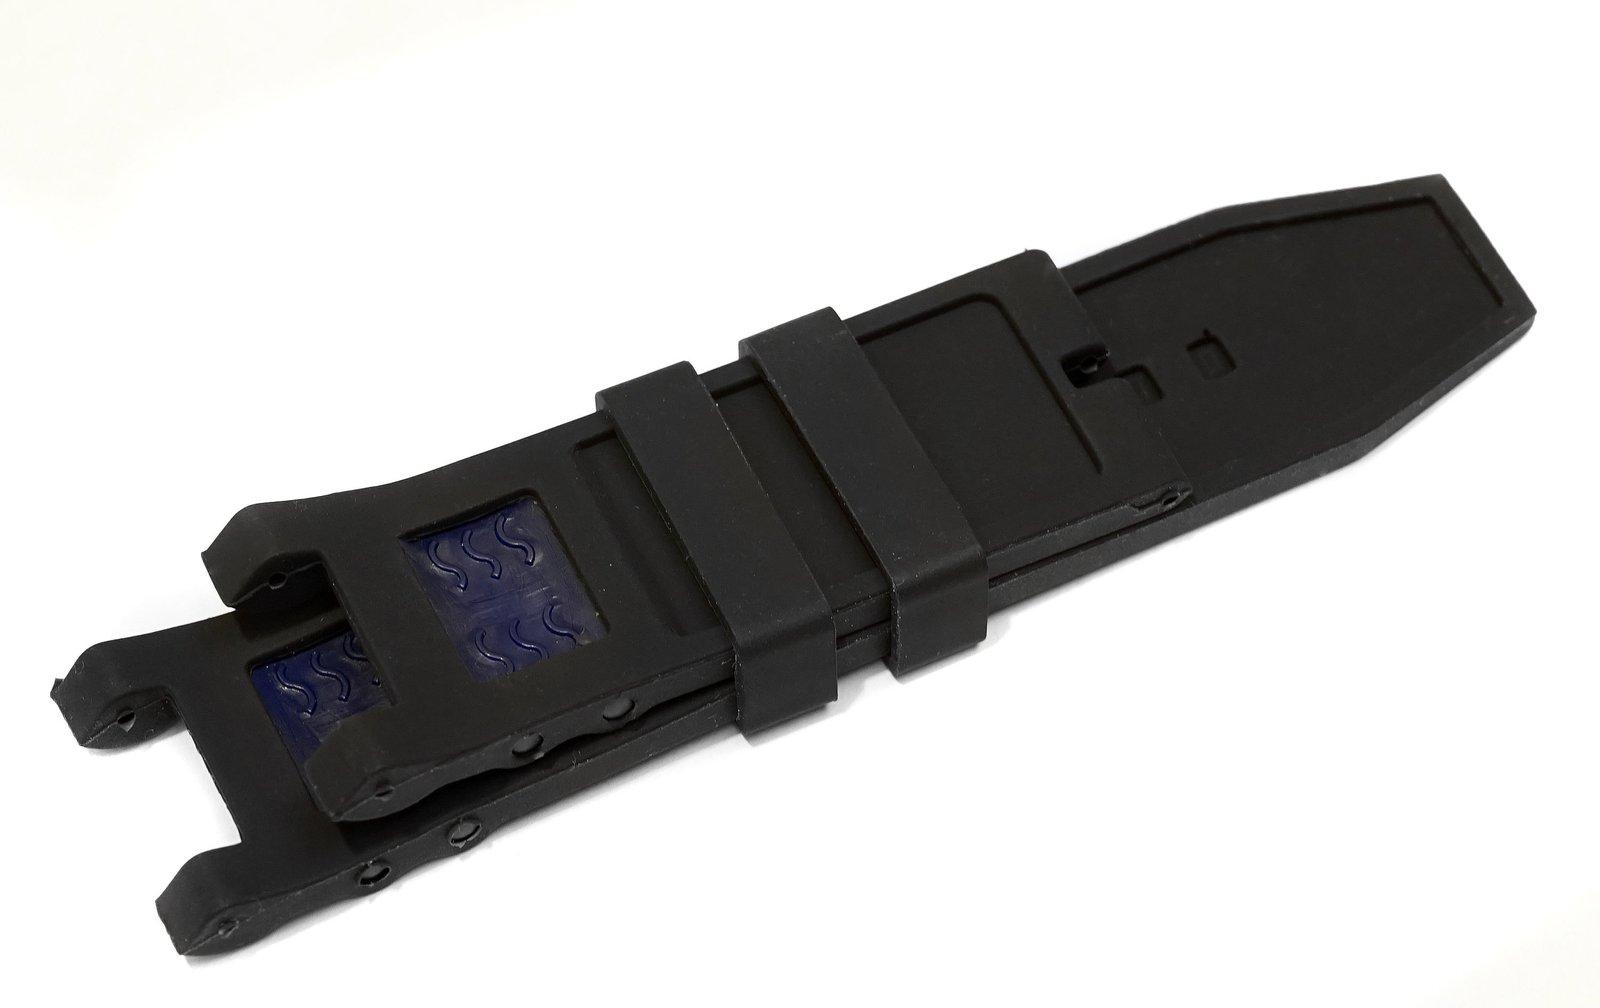 Silicone Rubber Watch Band Strap For Invicta Subaqua Noma III 6043 Top Quality